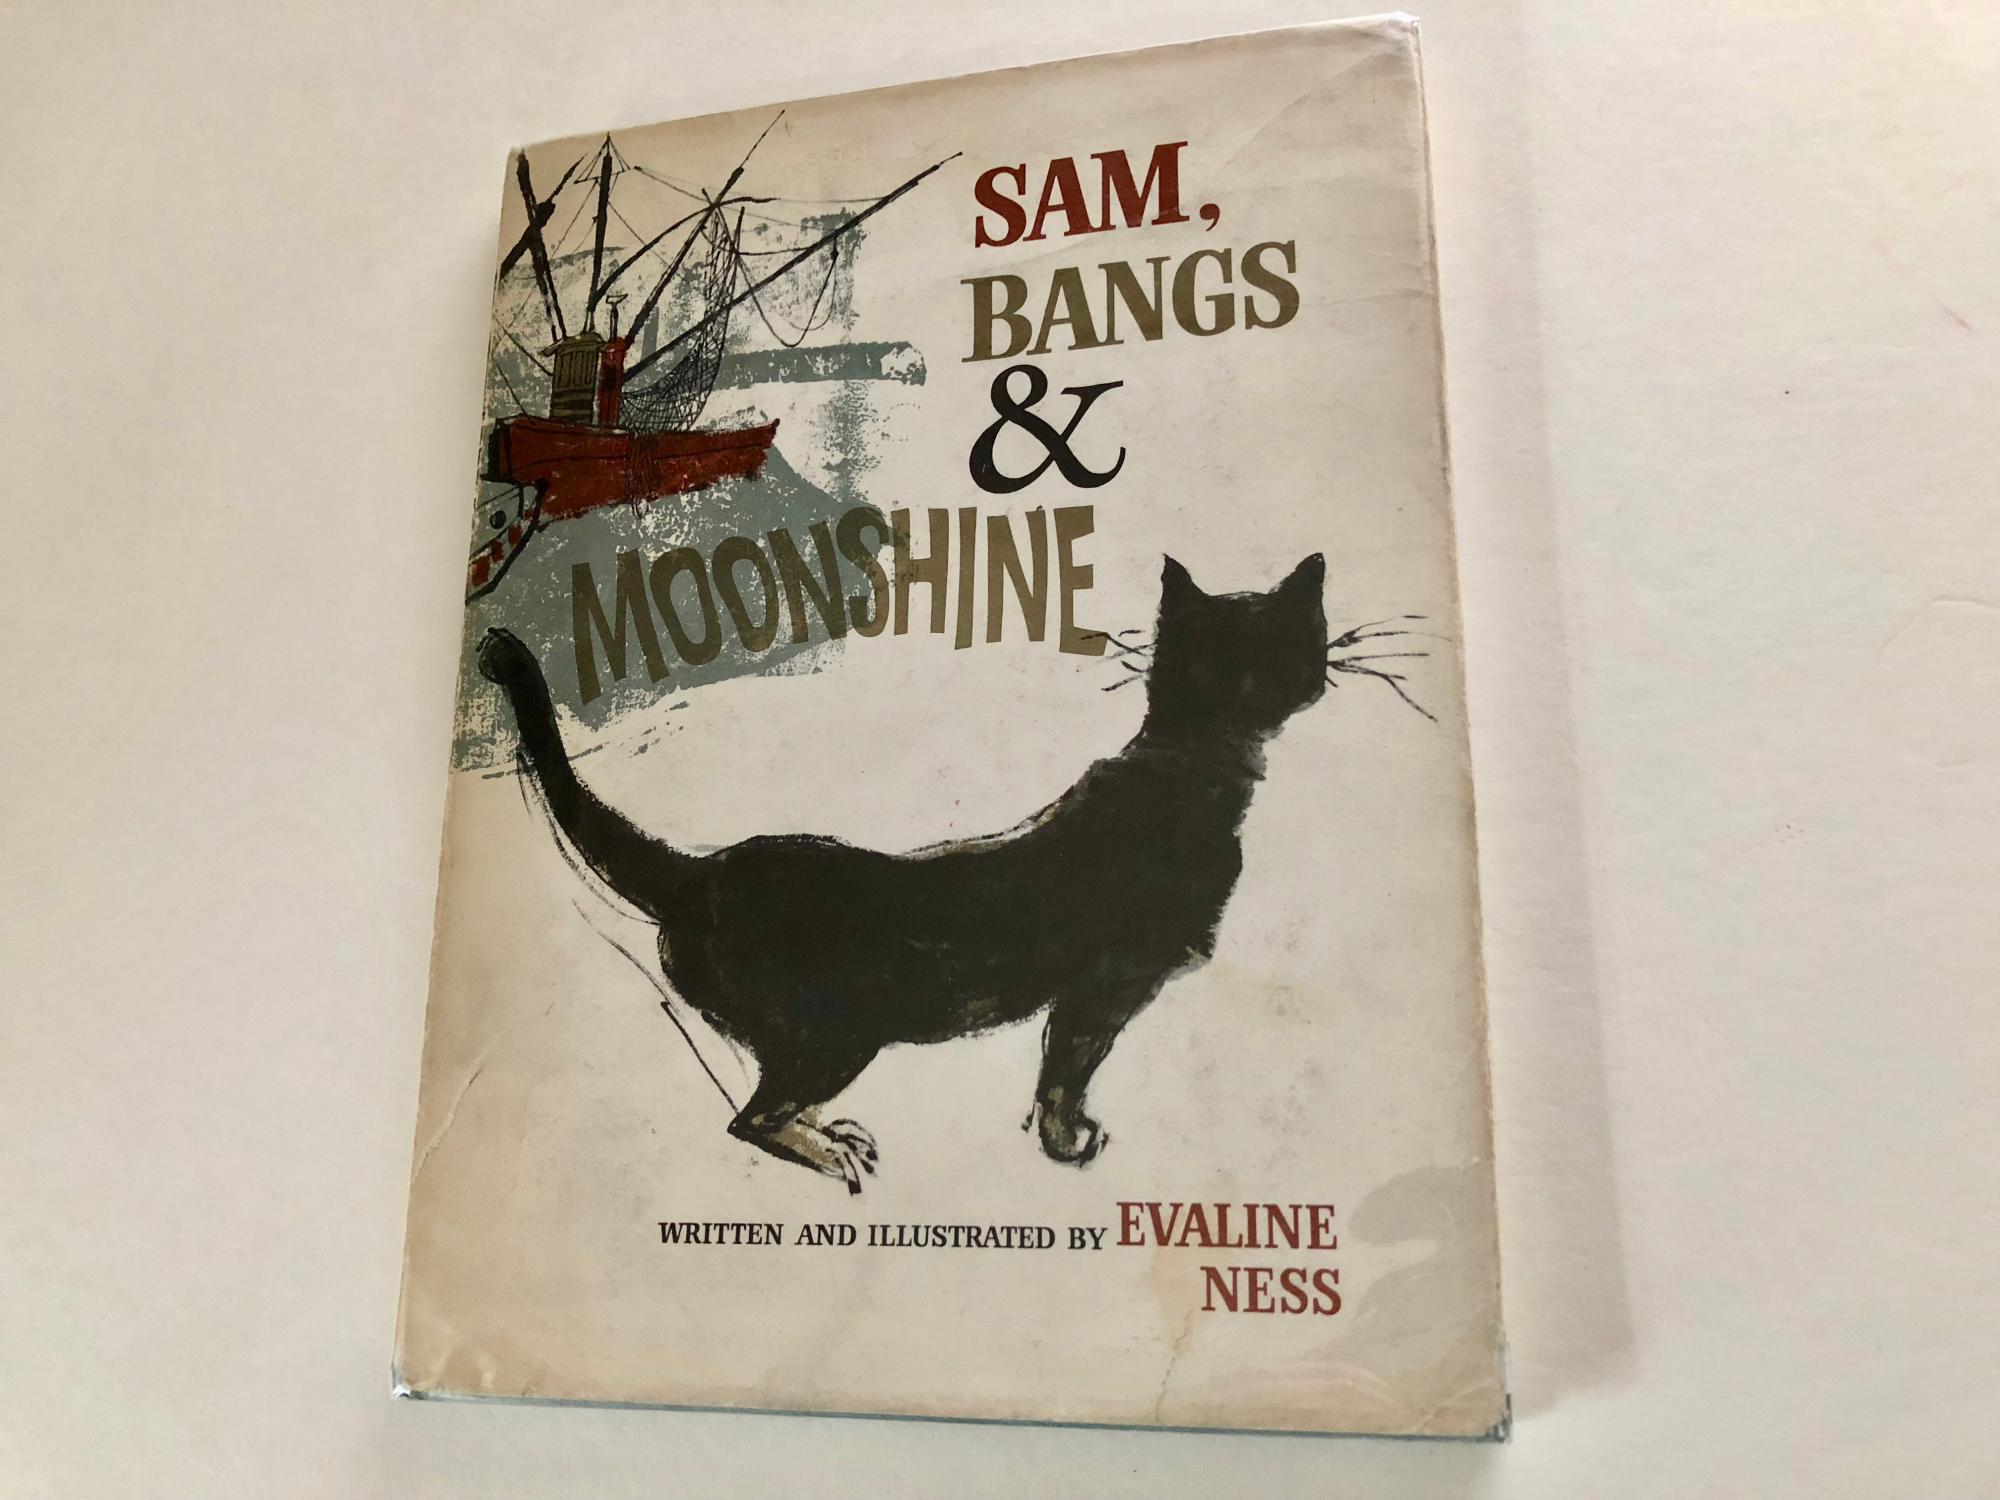 Amazing Deals On Moonshine Book